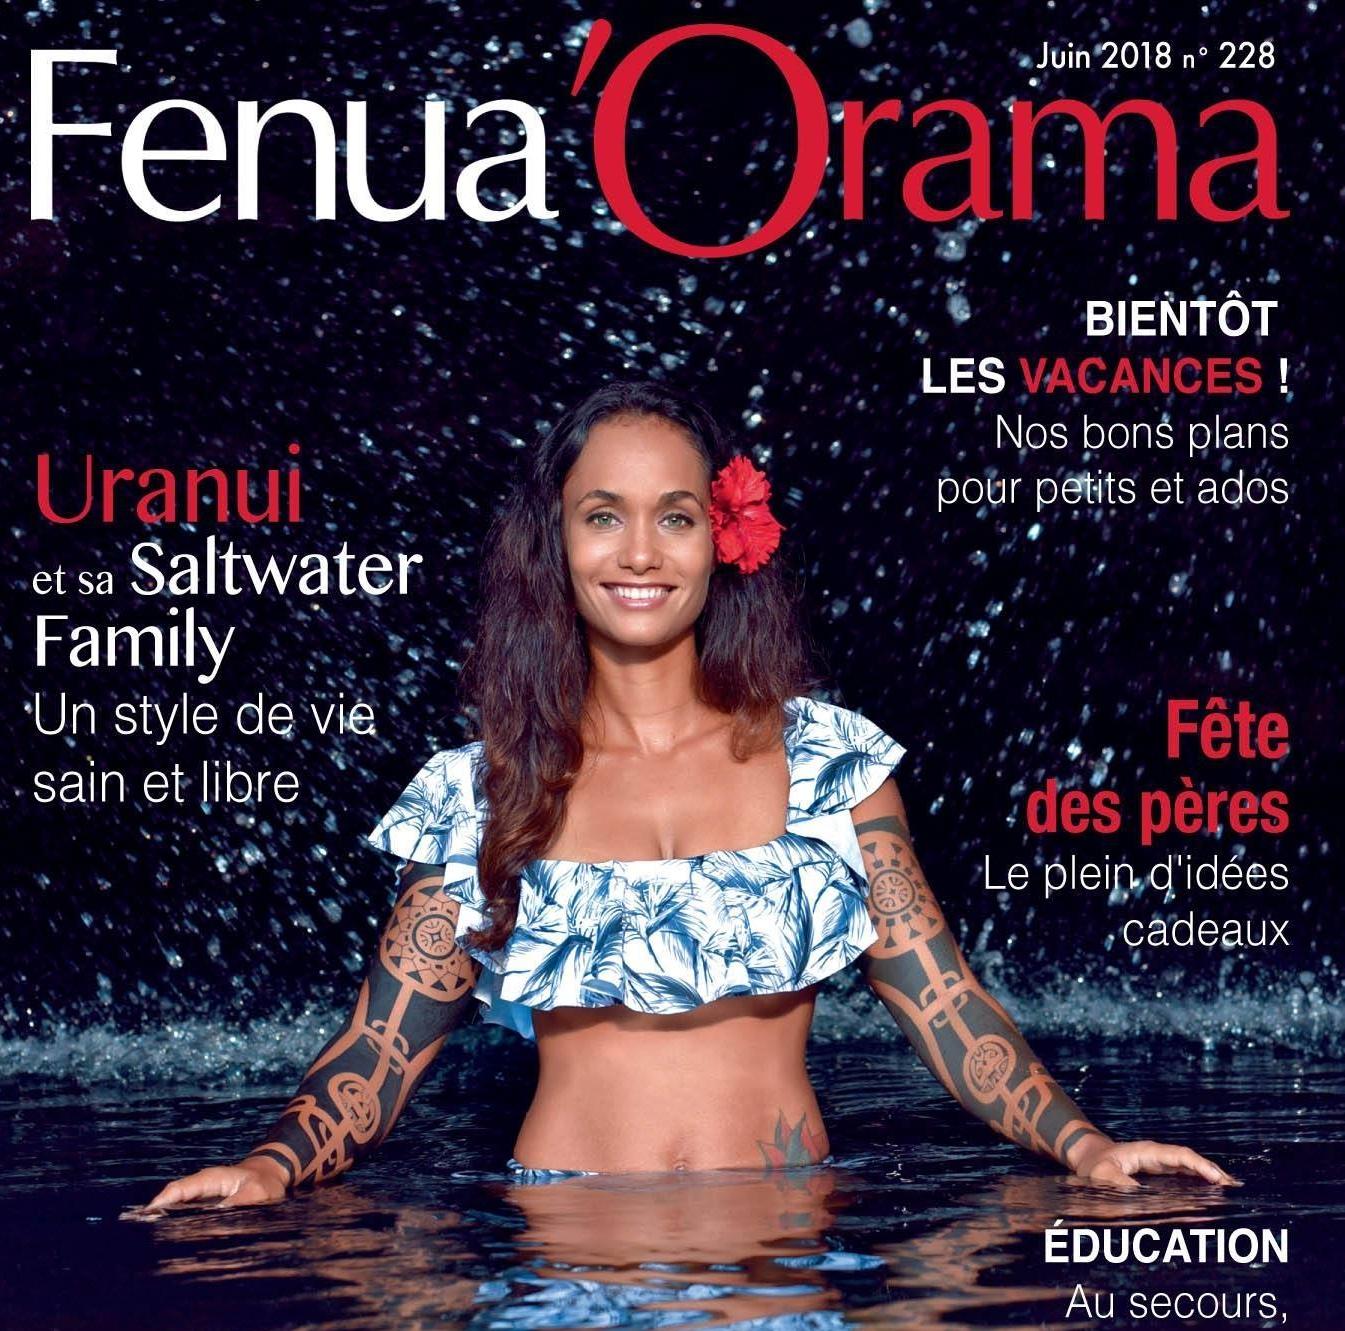 FENUA 'orama - june 2018 - Photoshoot Holiday's spiritMiel.A Tahiti jewelry